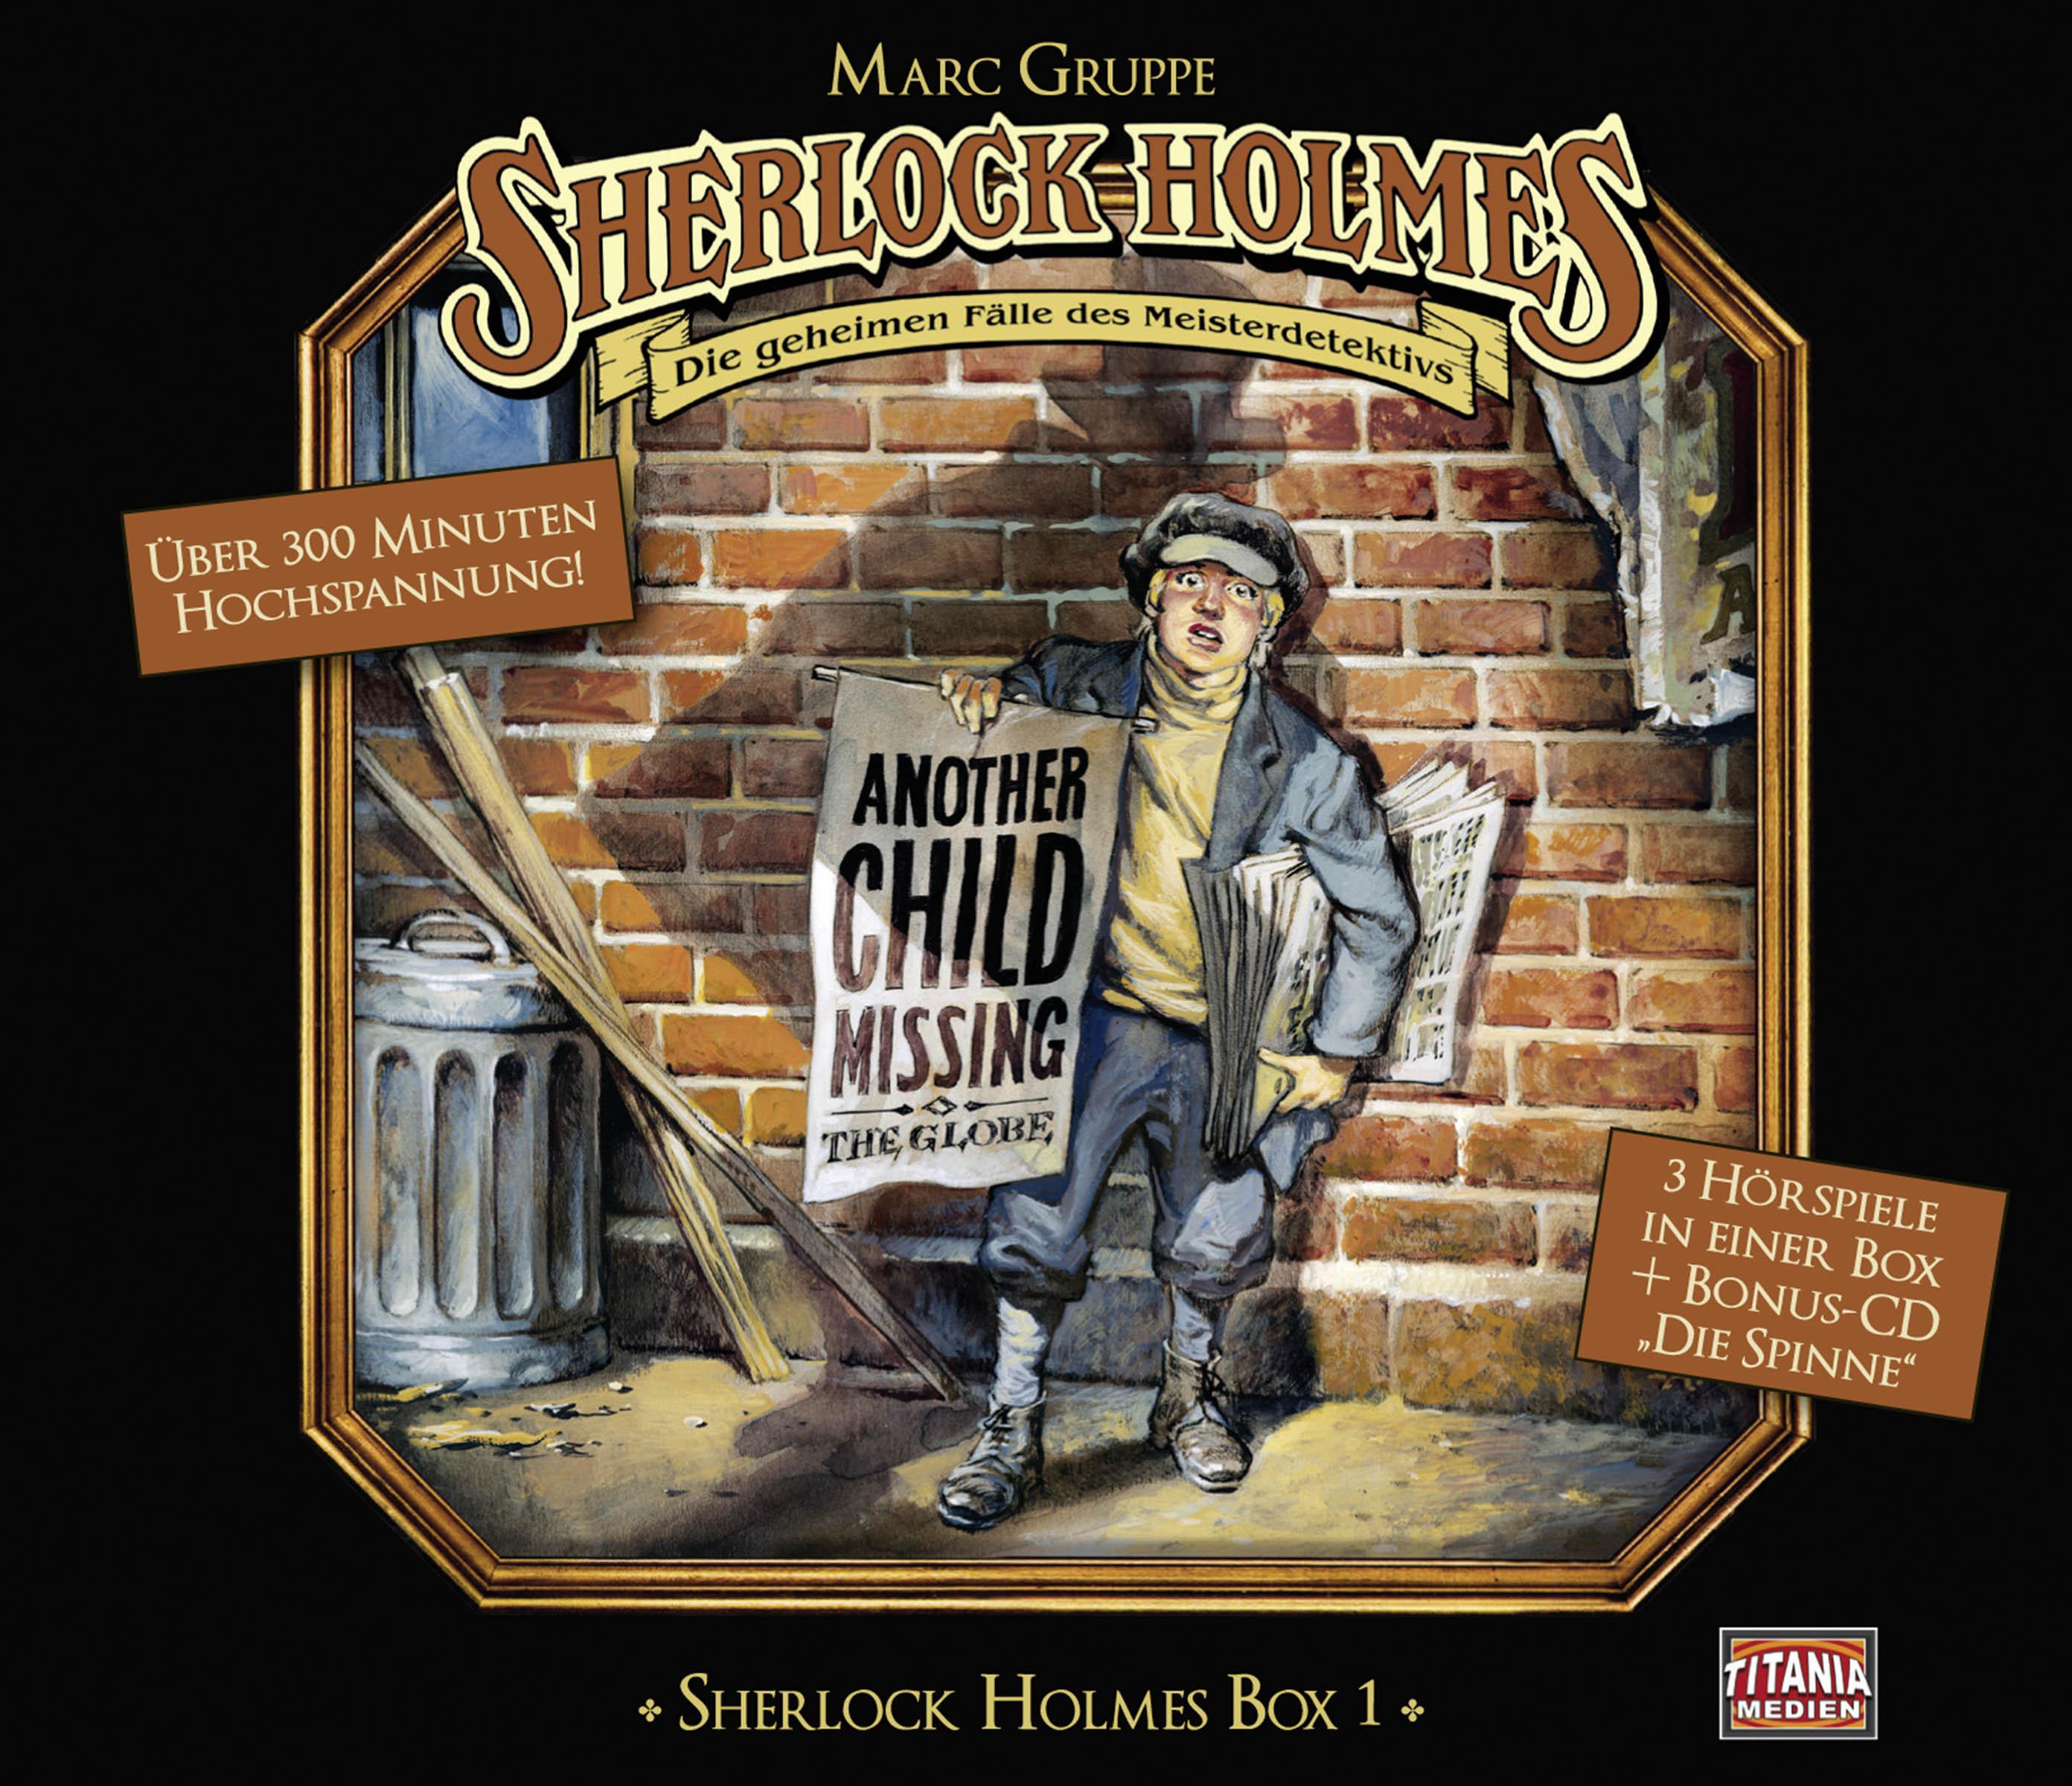 Sherlock Holmes Box 1